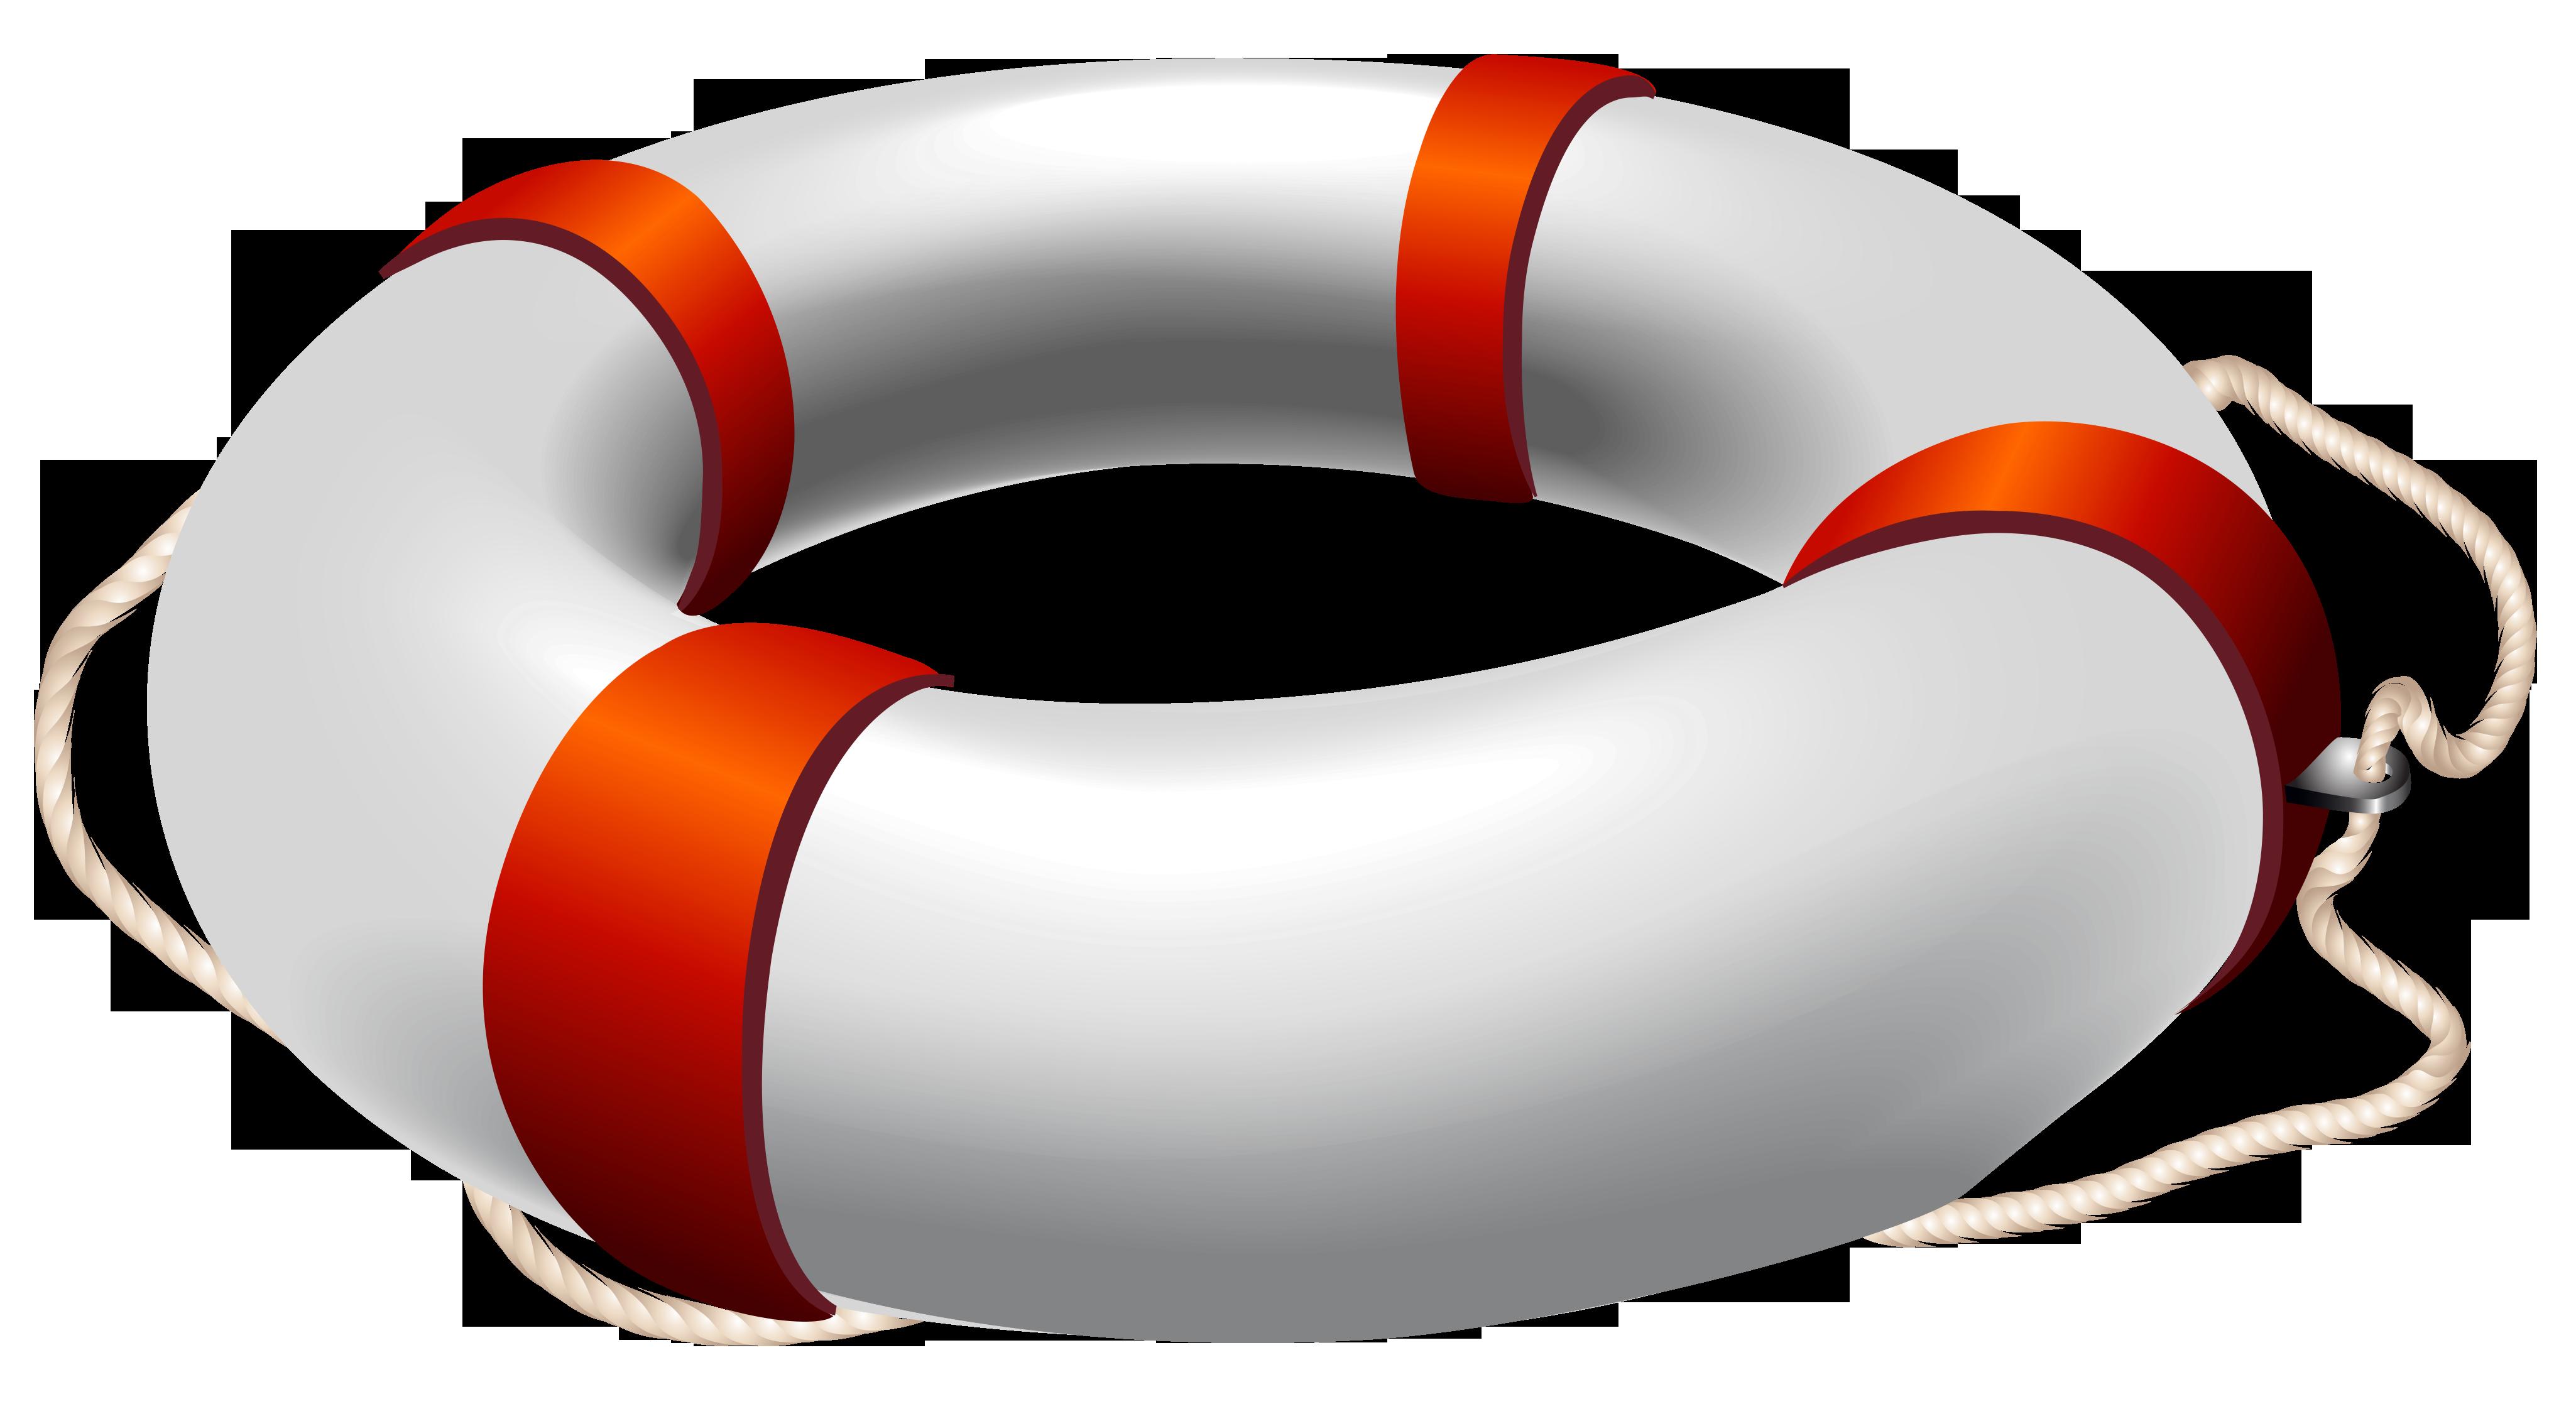 Transparent White Life Belt PNG Clipart.